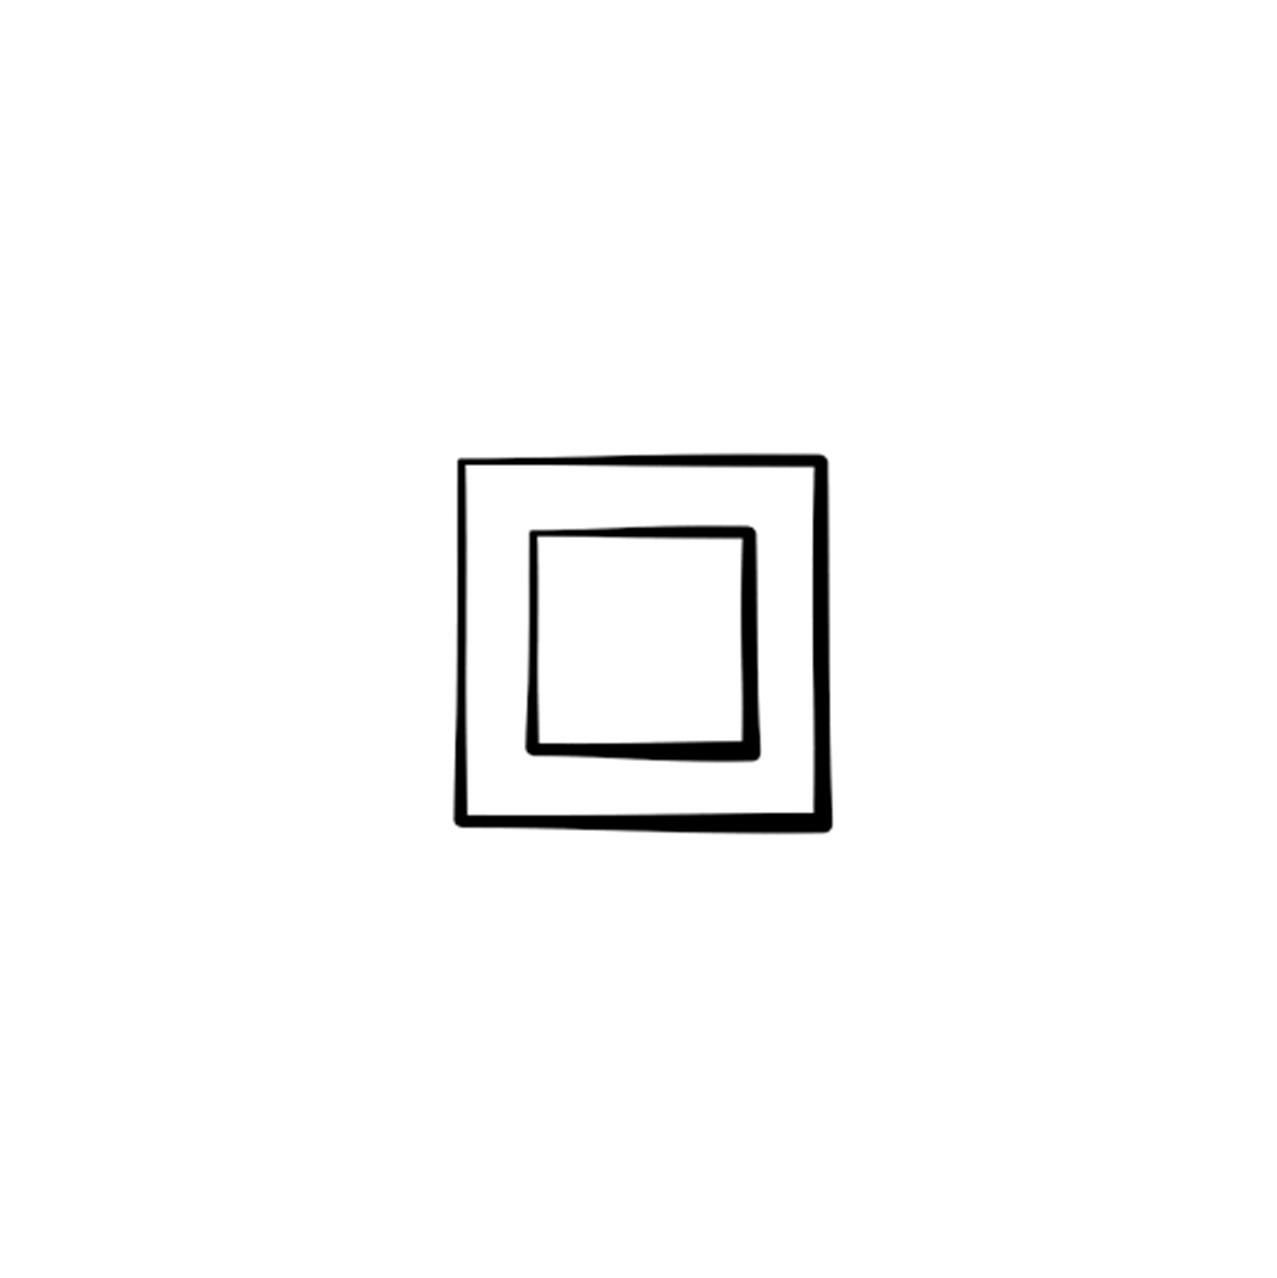 print2_icon_large_square.jpg